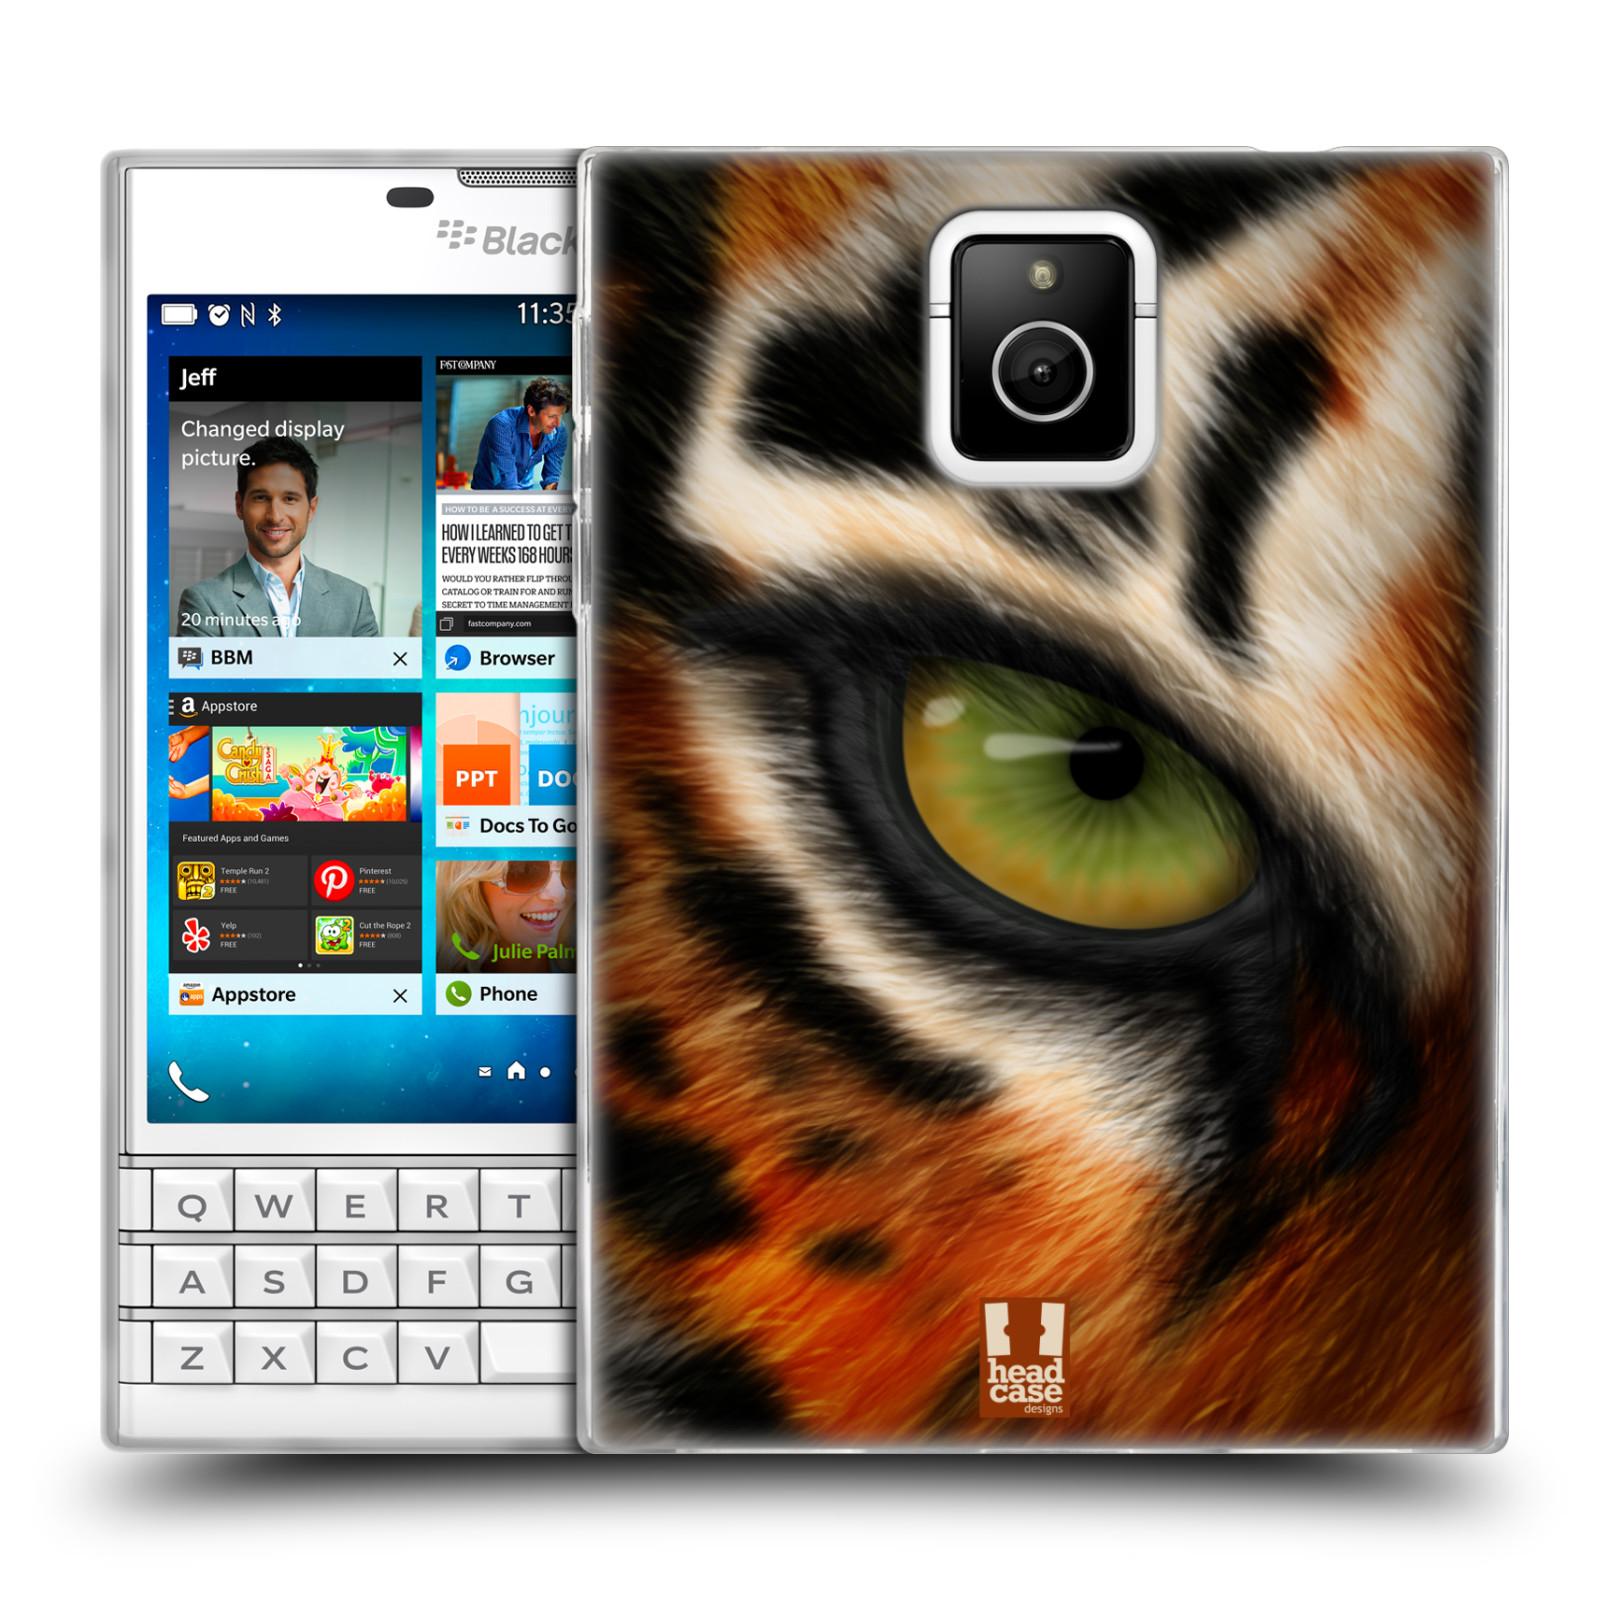 HEAD CASE silikonový obal na mobil Blackberry PASSPORT vzor pohled zvířete oko tygr